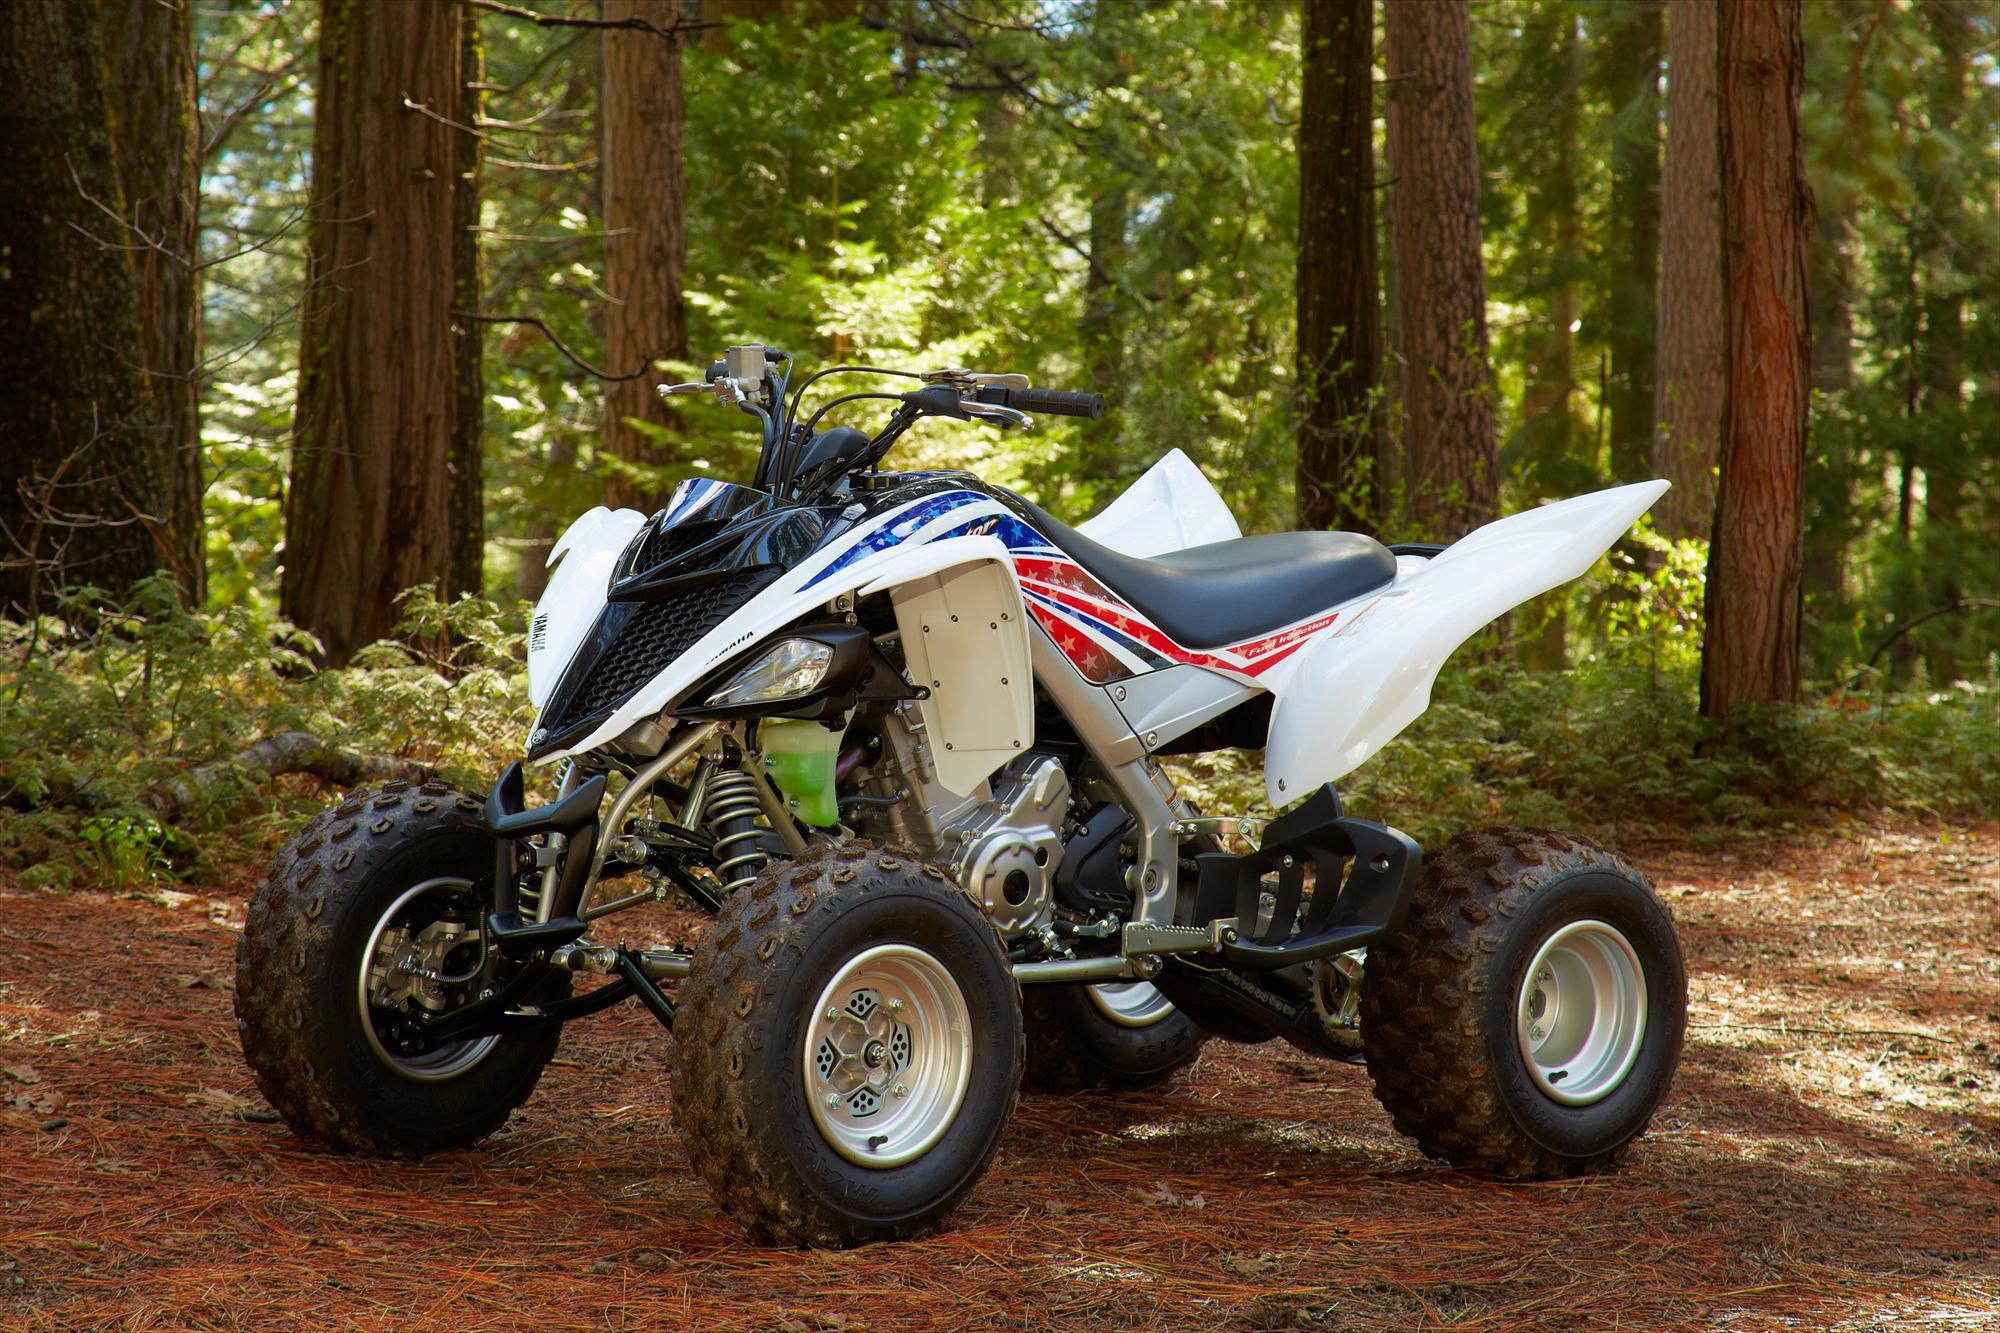 2013 Yamaha Raptor 700 The Big Engine Quad Autoevolution